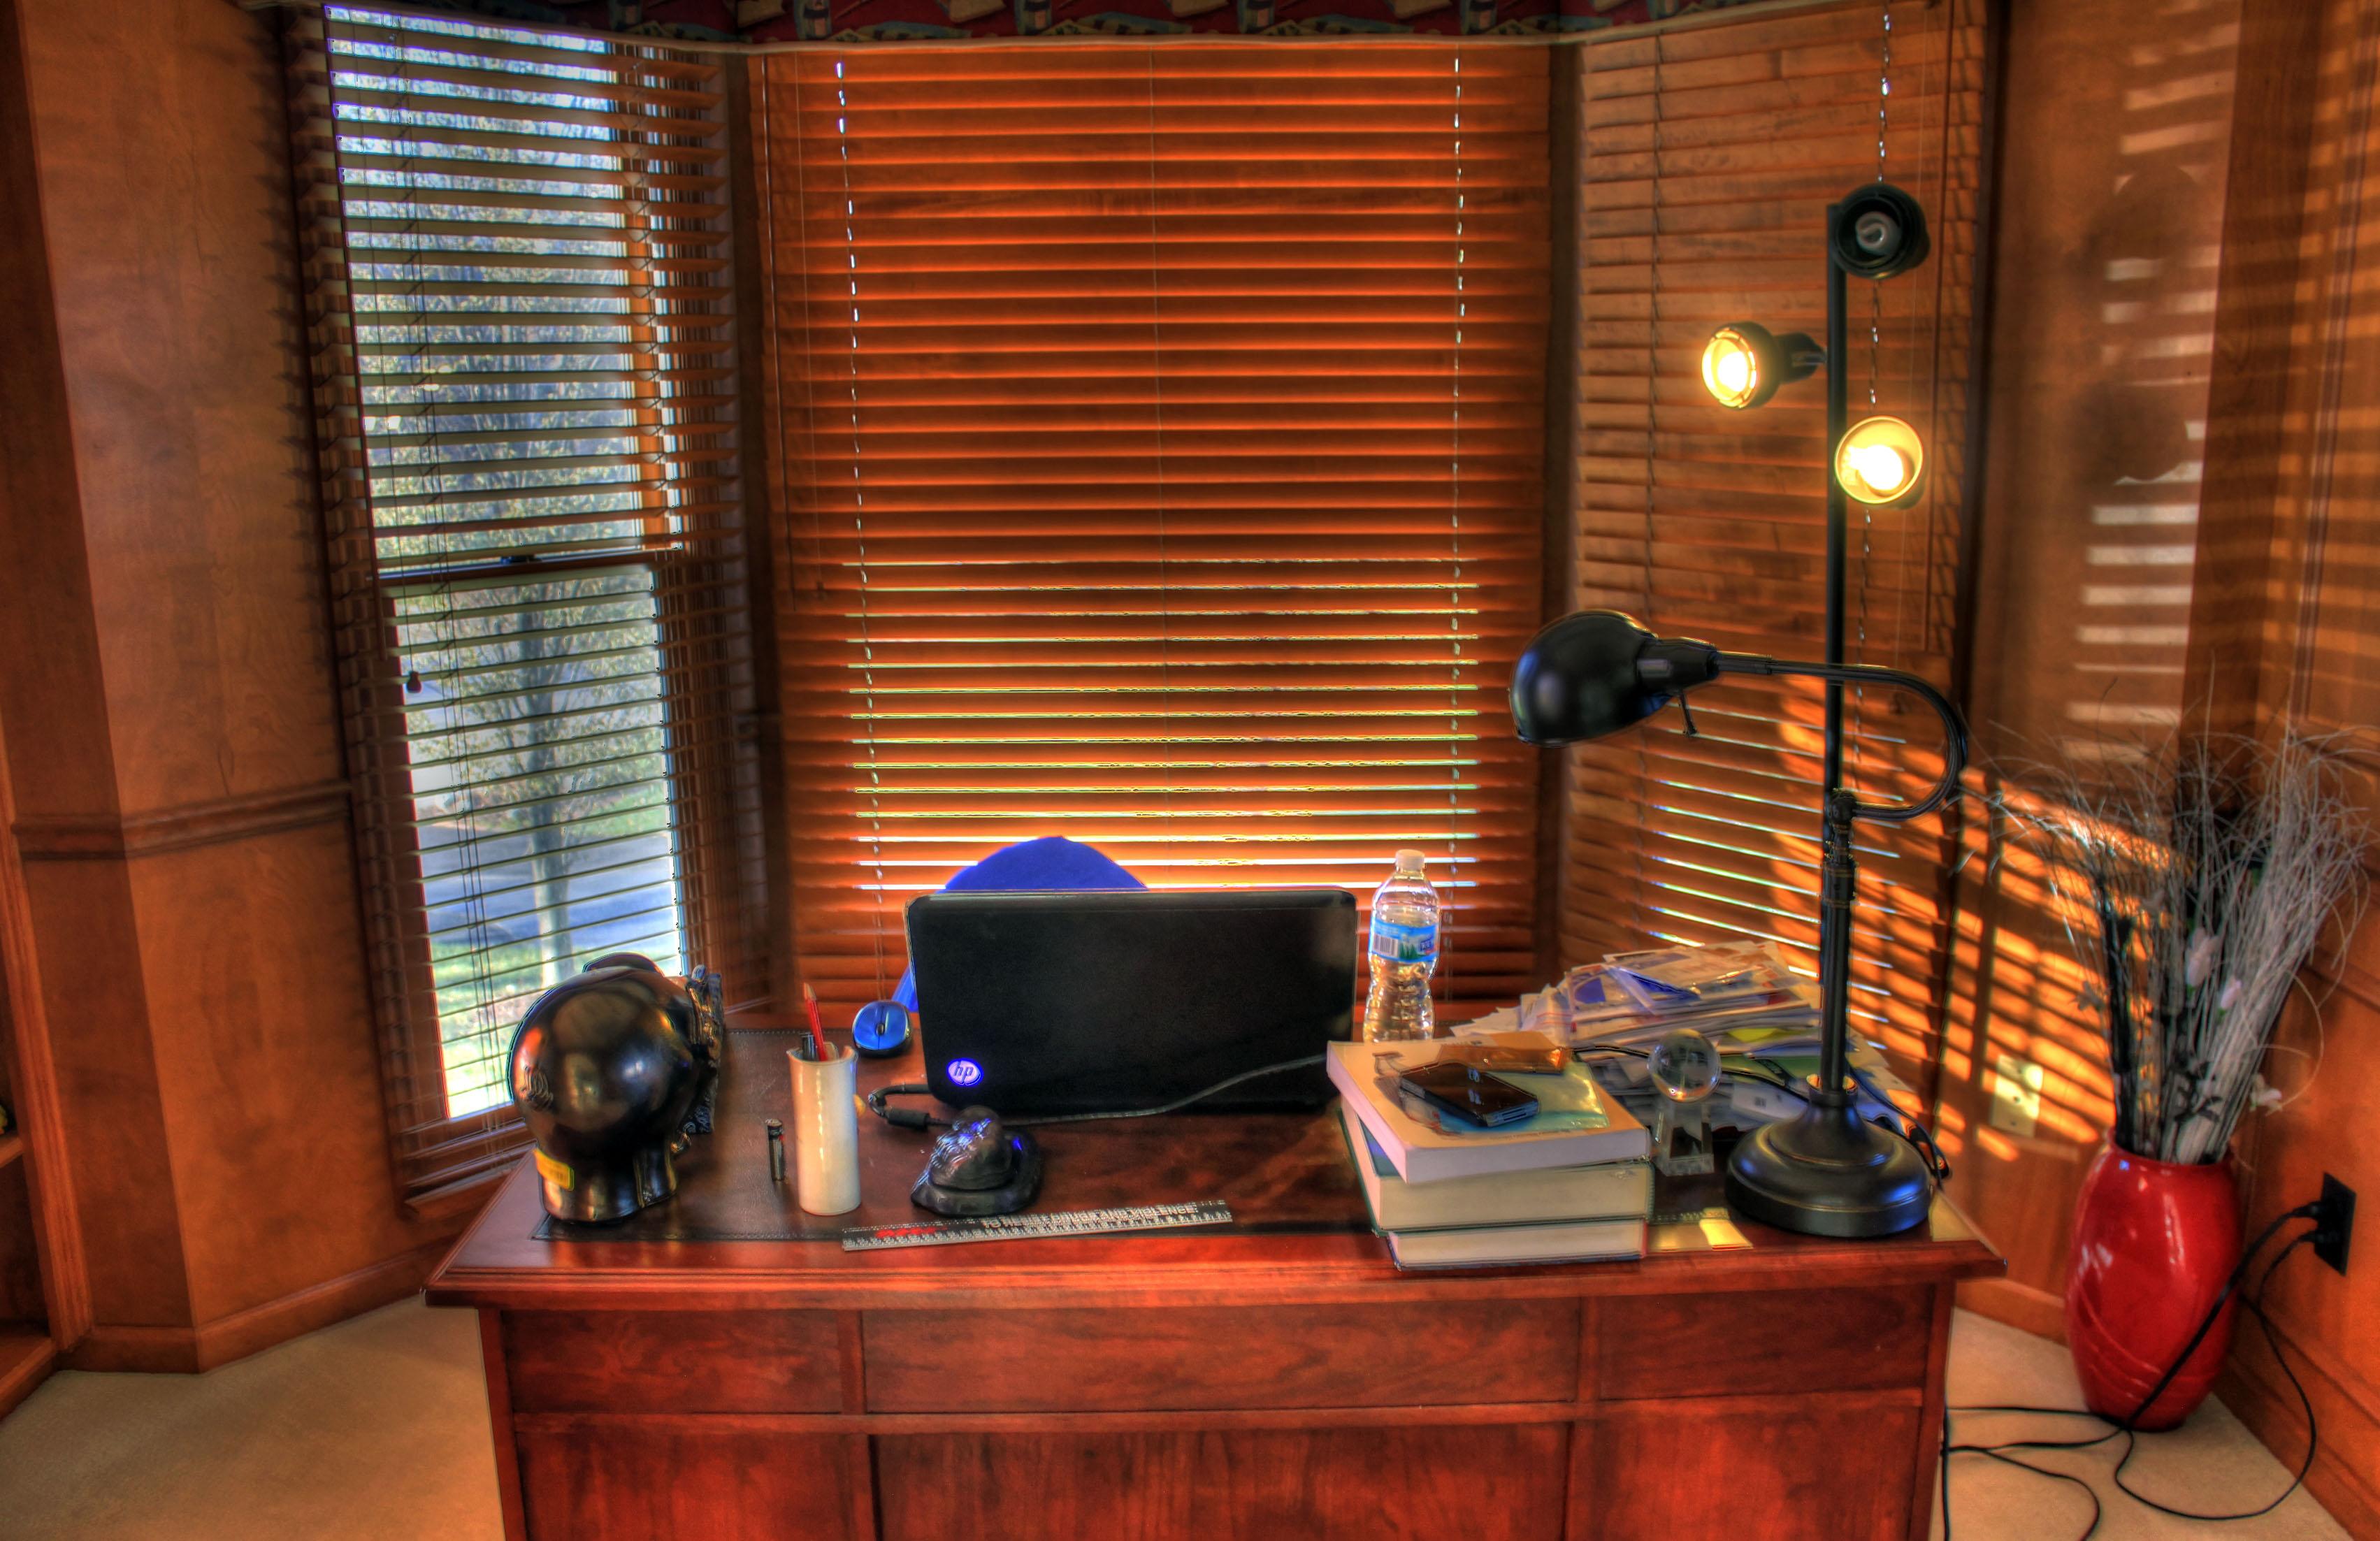 Office Room image - Free stock photo - Public Domain photo ...